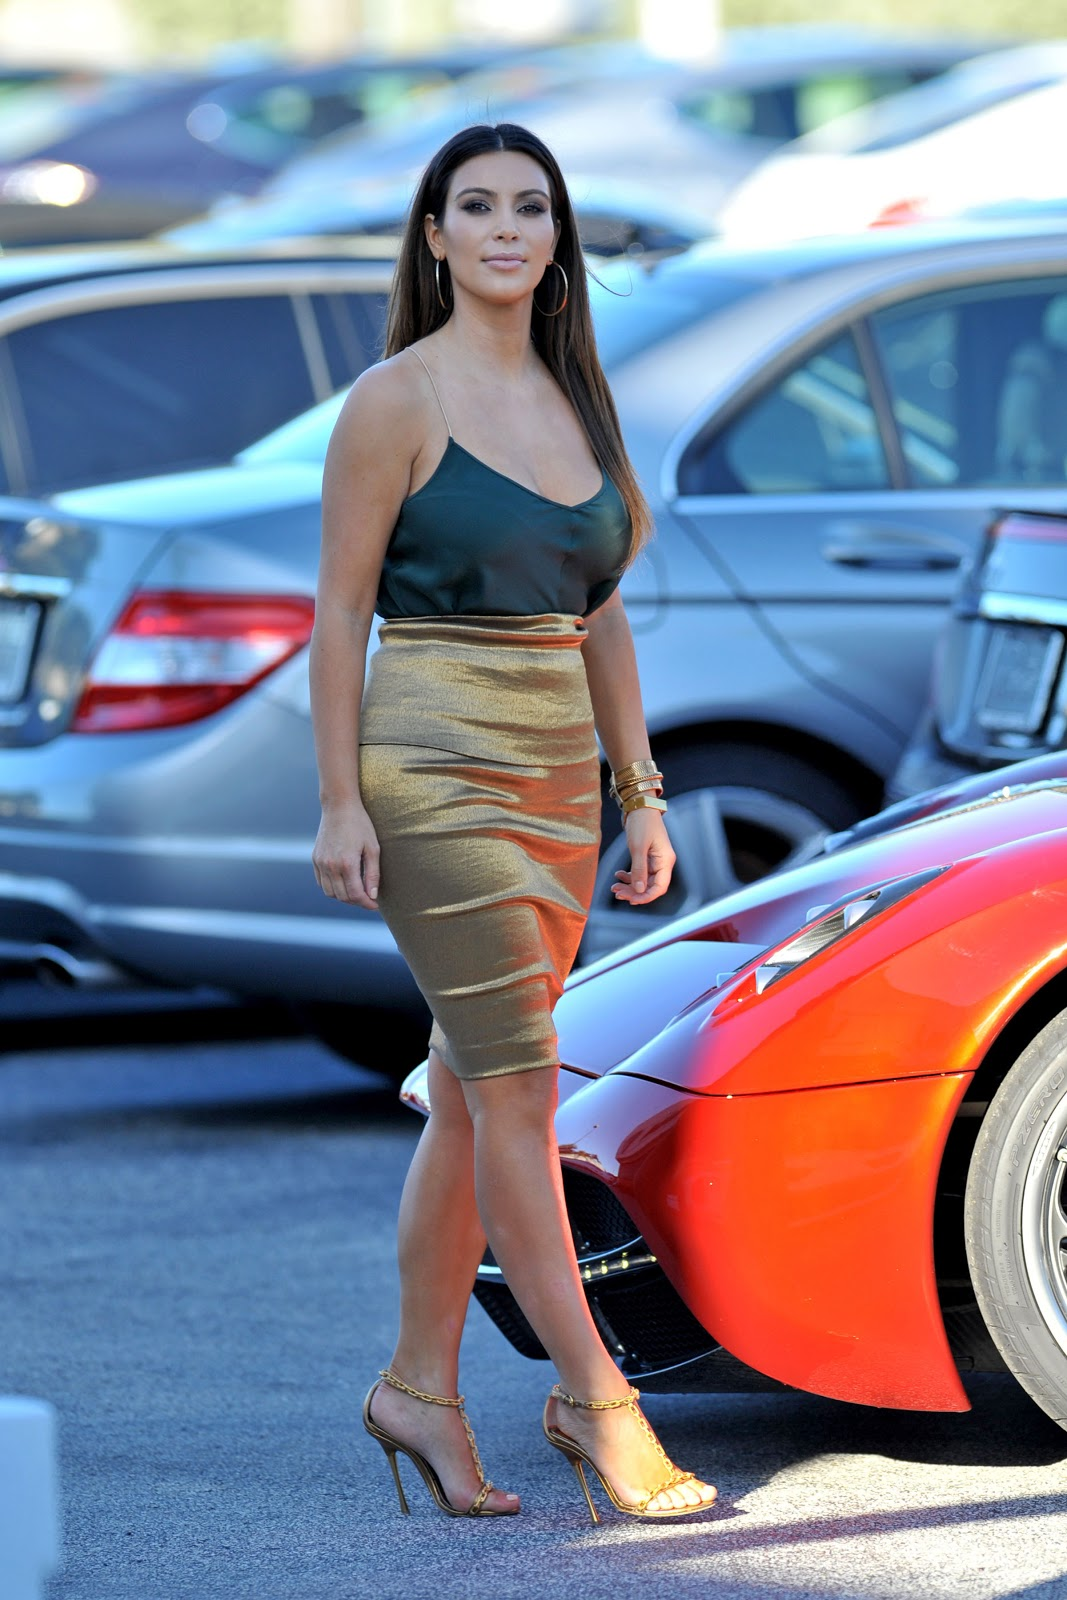 http://1.bp.blogspot.com/-biXYHaPU2BU/UJE6hREeXiI/AAAAAAAAXoI/RhTzJXnslTg/s1600/Kim+Kardashian++at+Prestige+Imports+car+showroom+in+Miami+October+30%252C+2012+-12.jpg